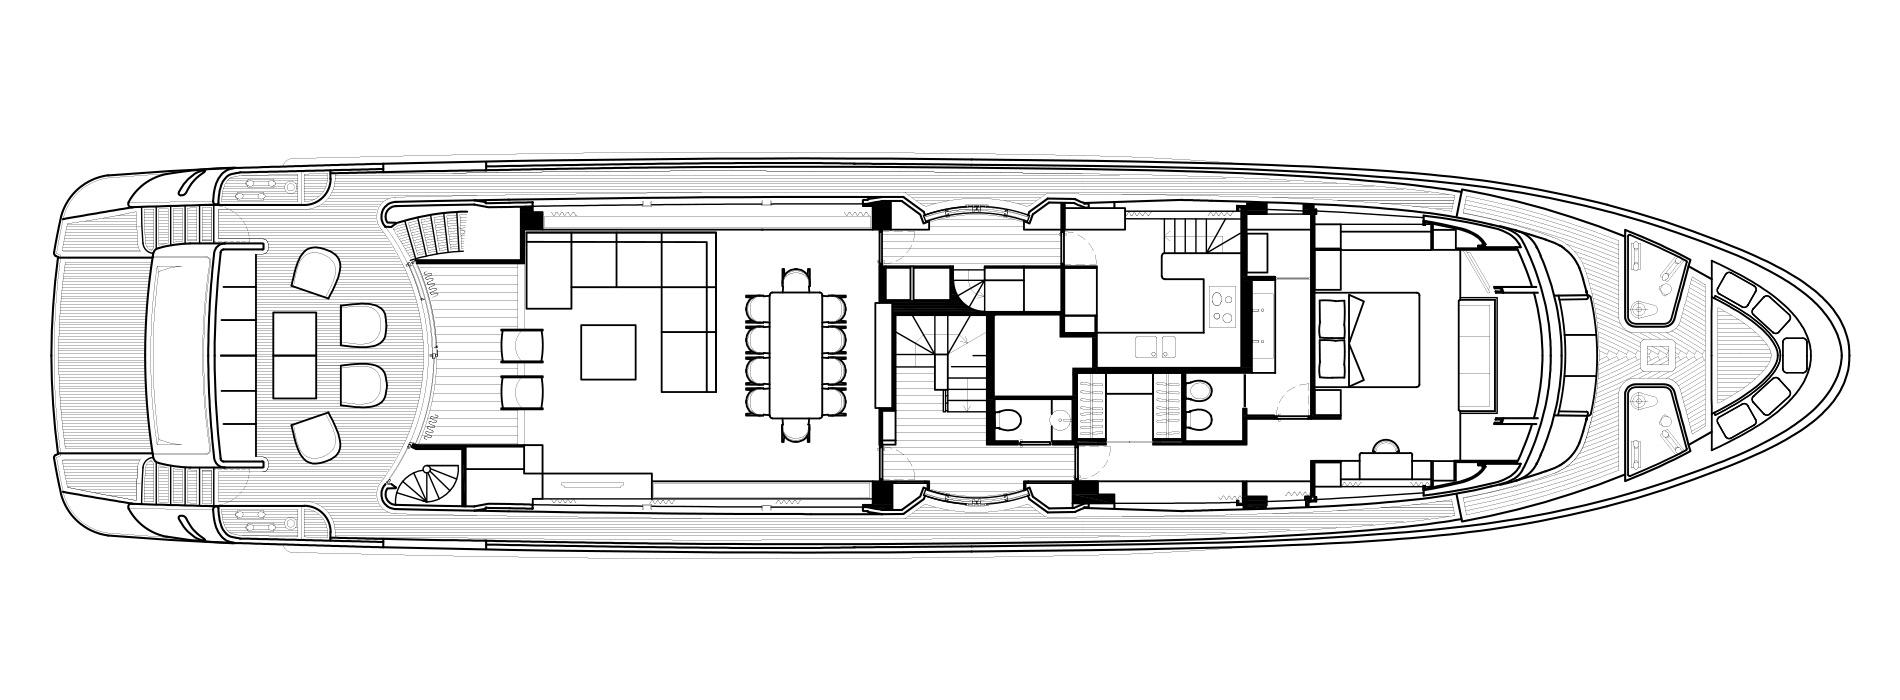 Sanlorenzo Yachts SD112 Главная палуба версия A